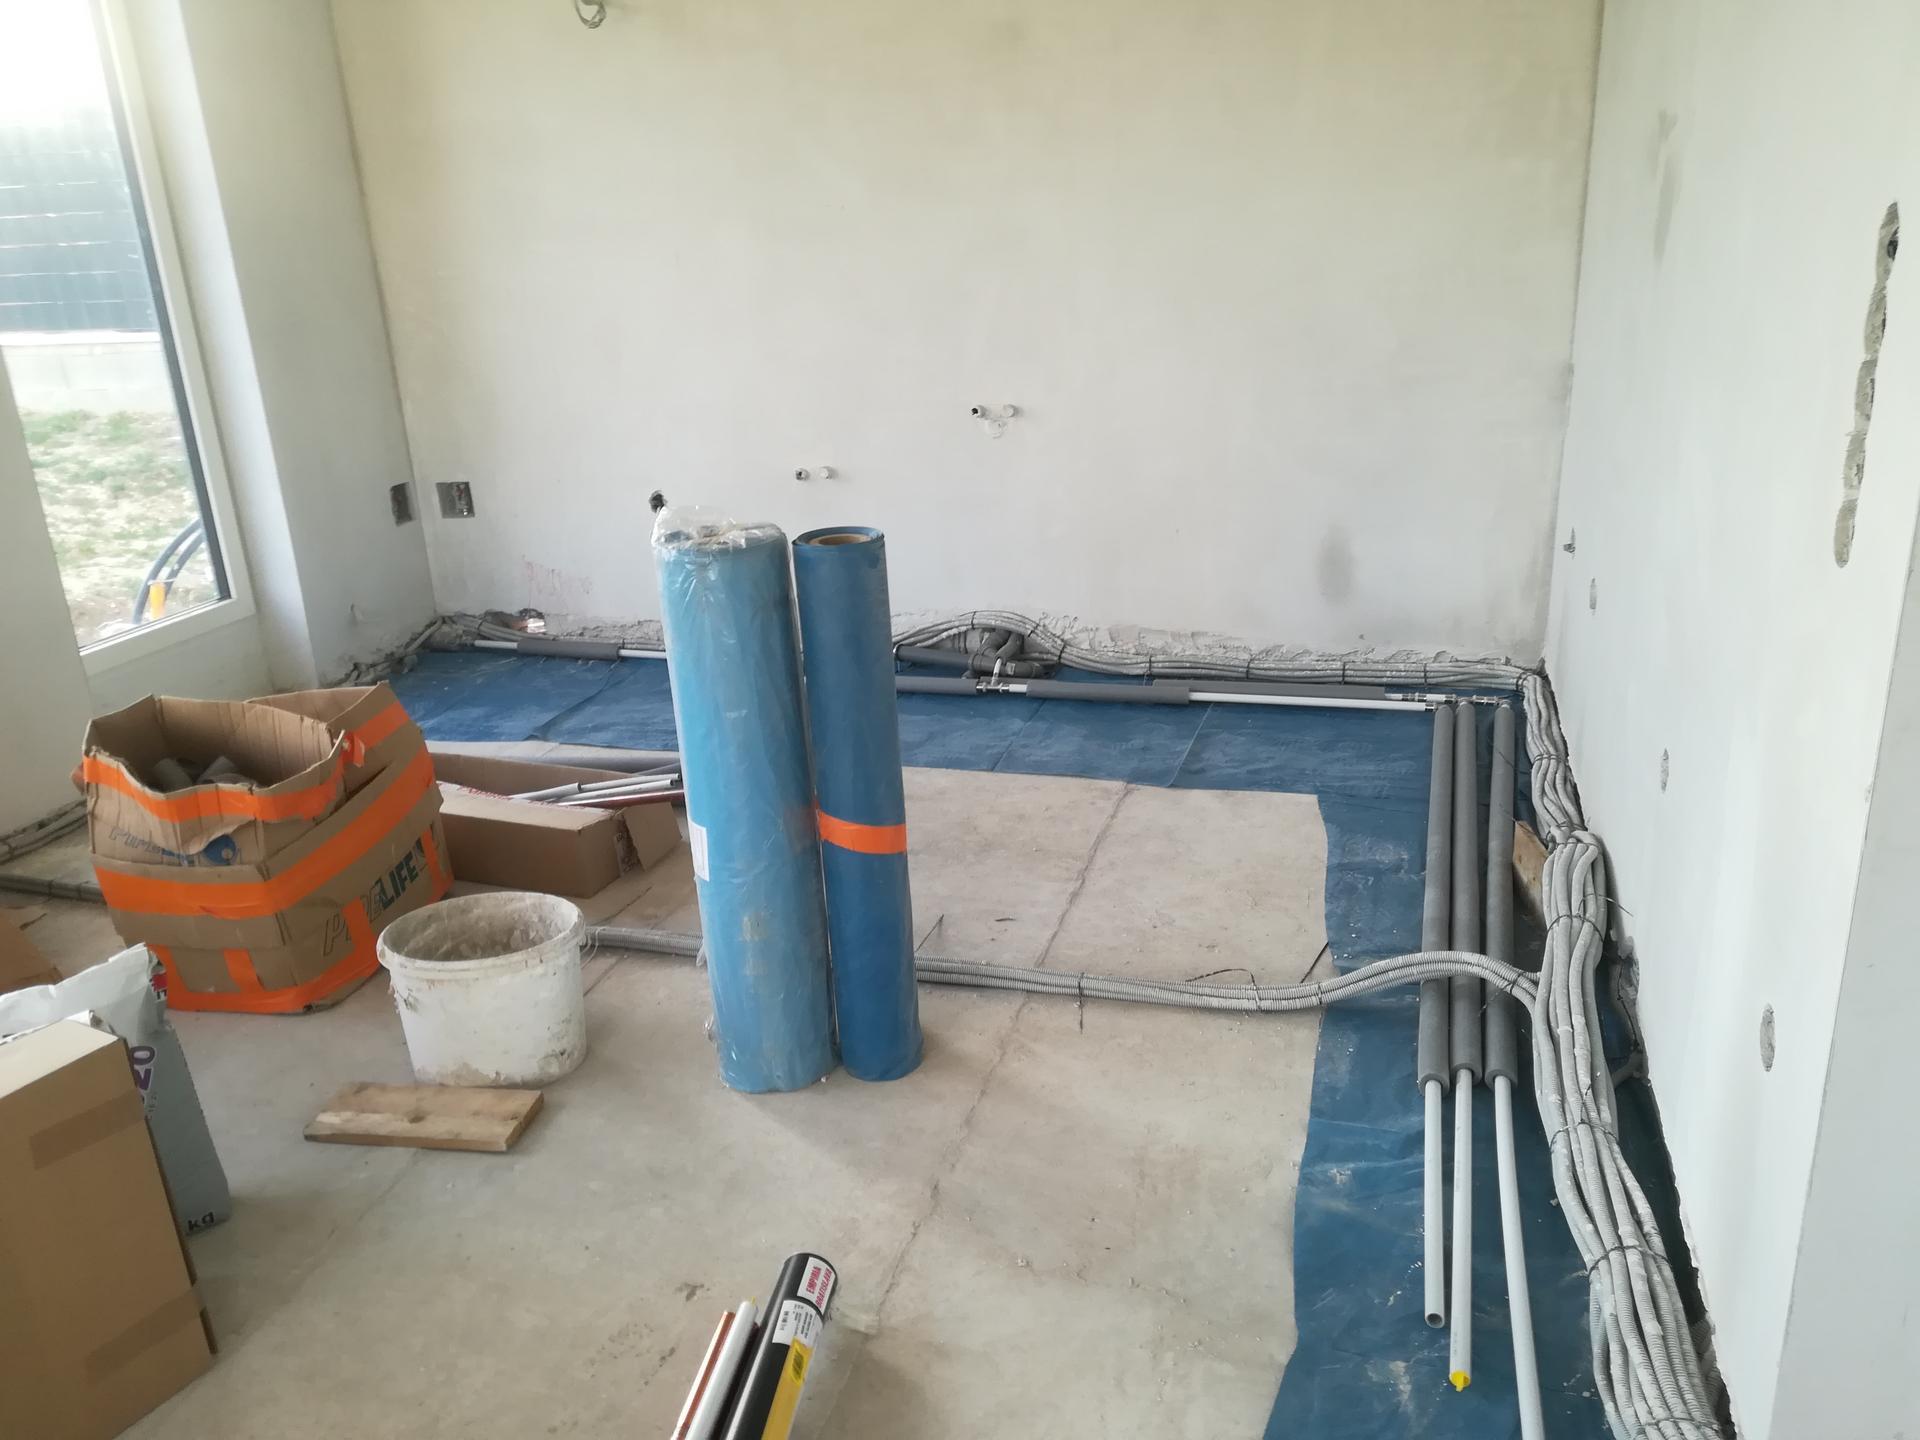 Das Haus - Dokoncuju sa vodoinstalacne prace.